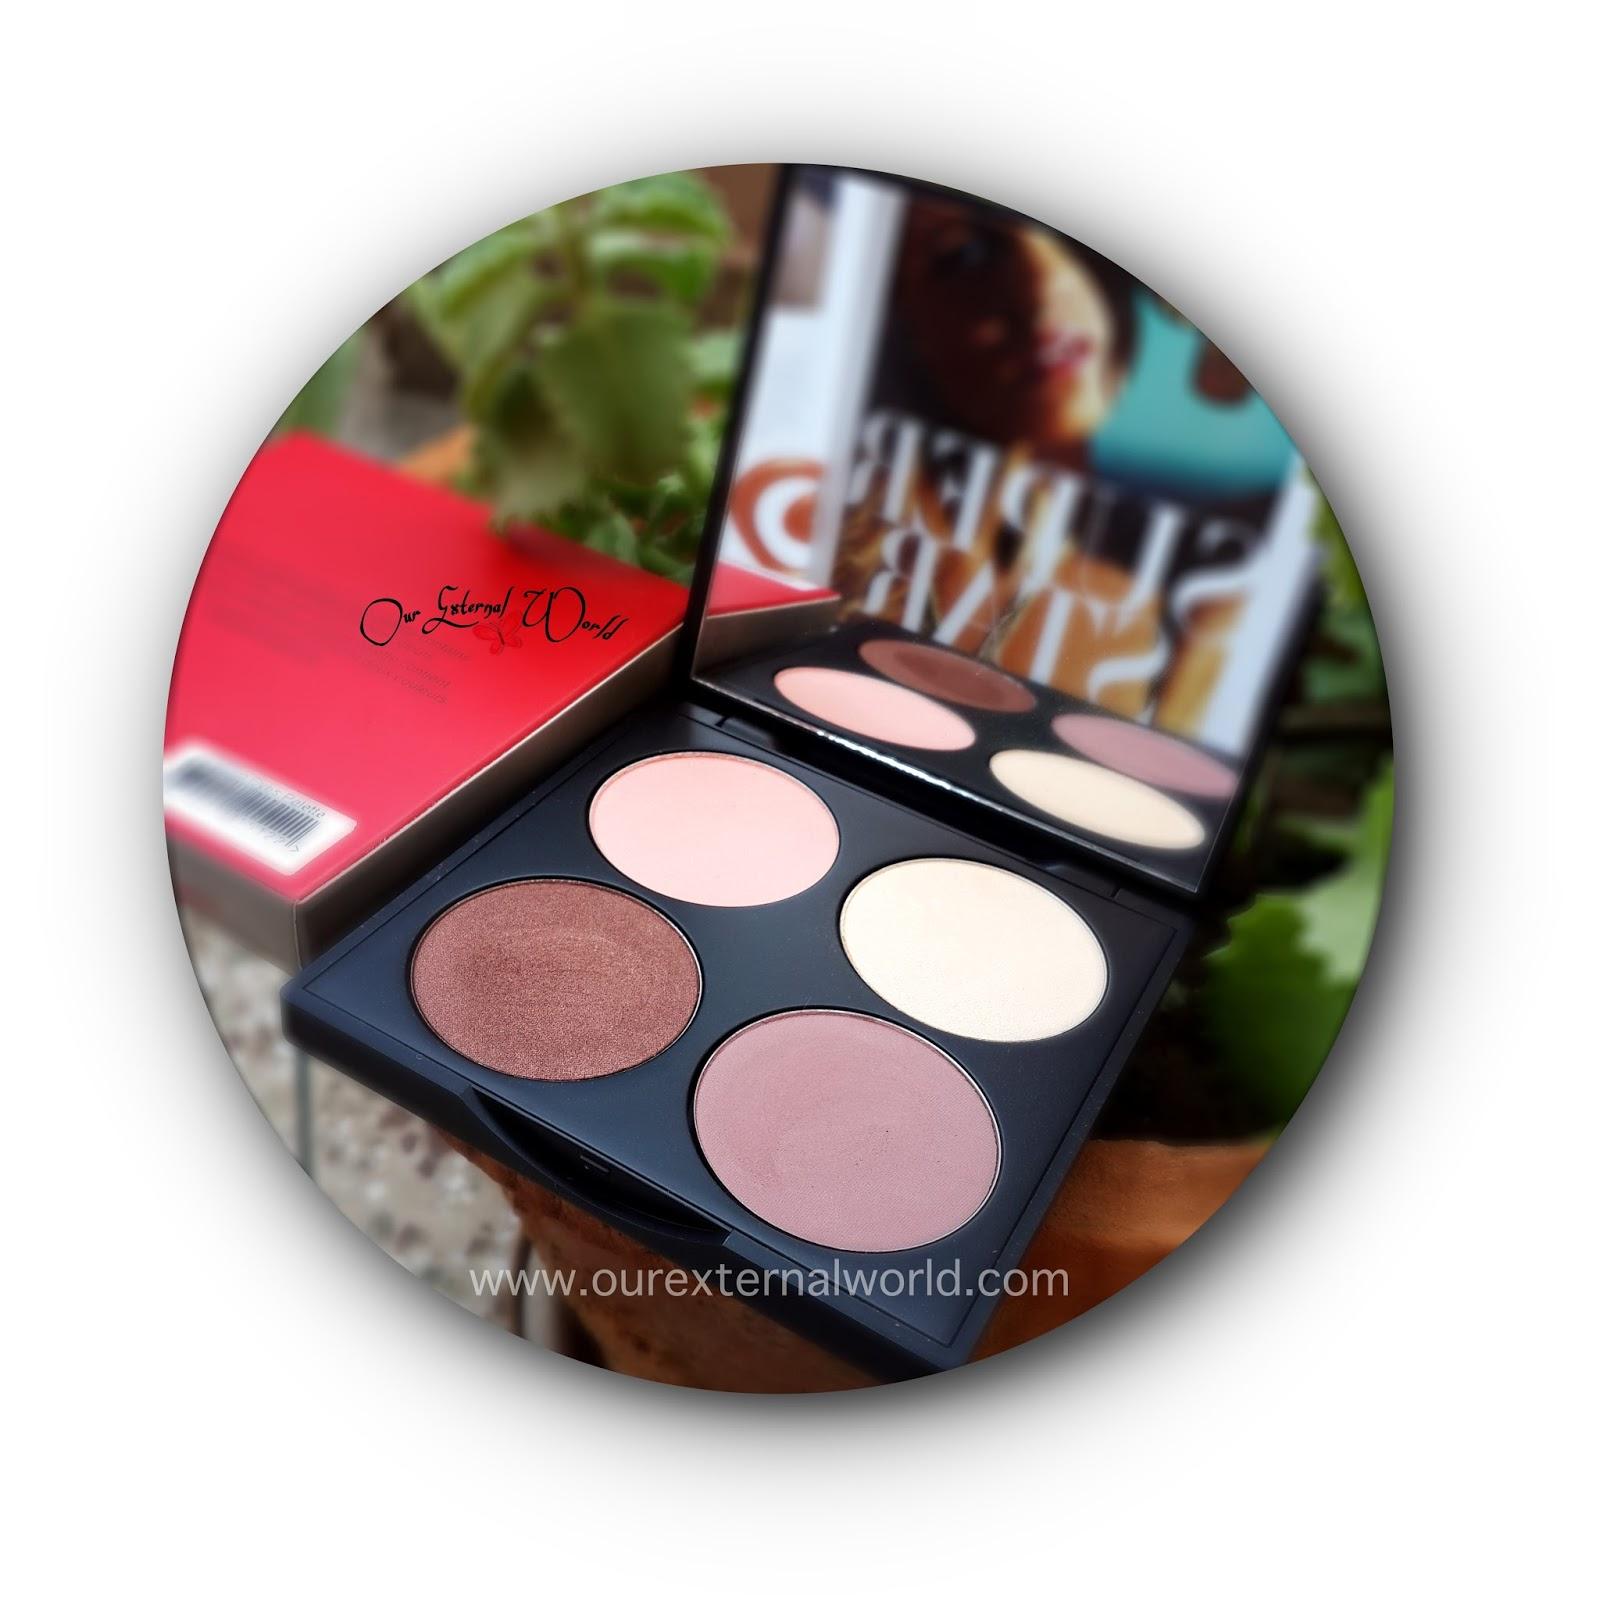 Gorgeous Cosmetics 4 Color Palette - Taupe, Peach, Copper -2555